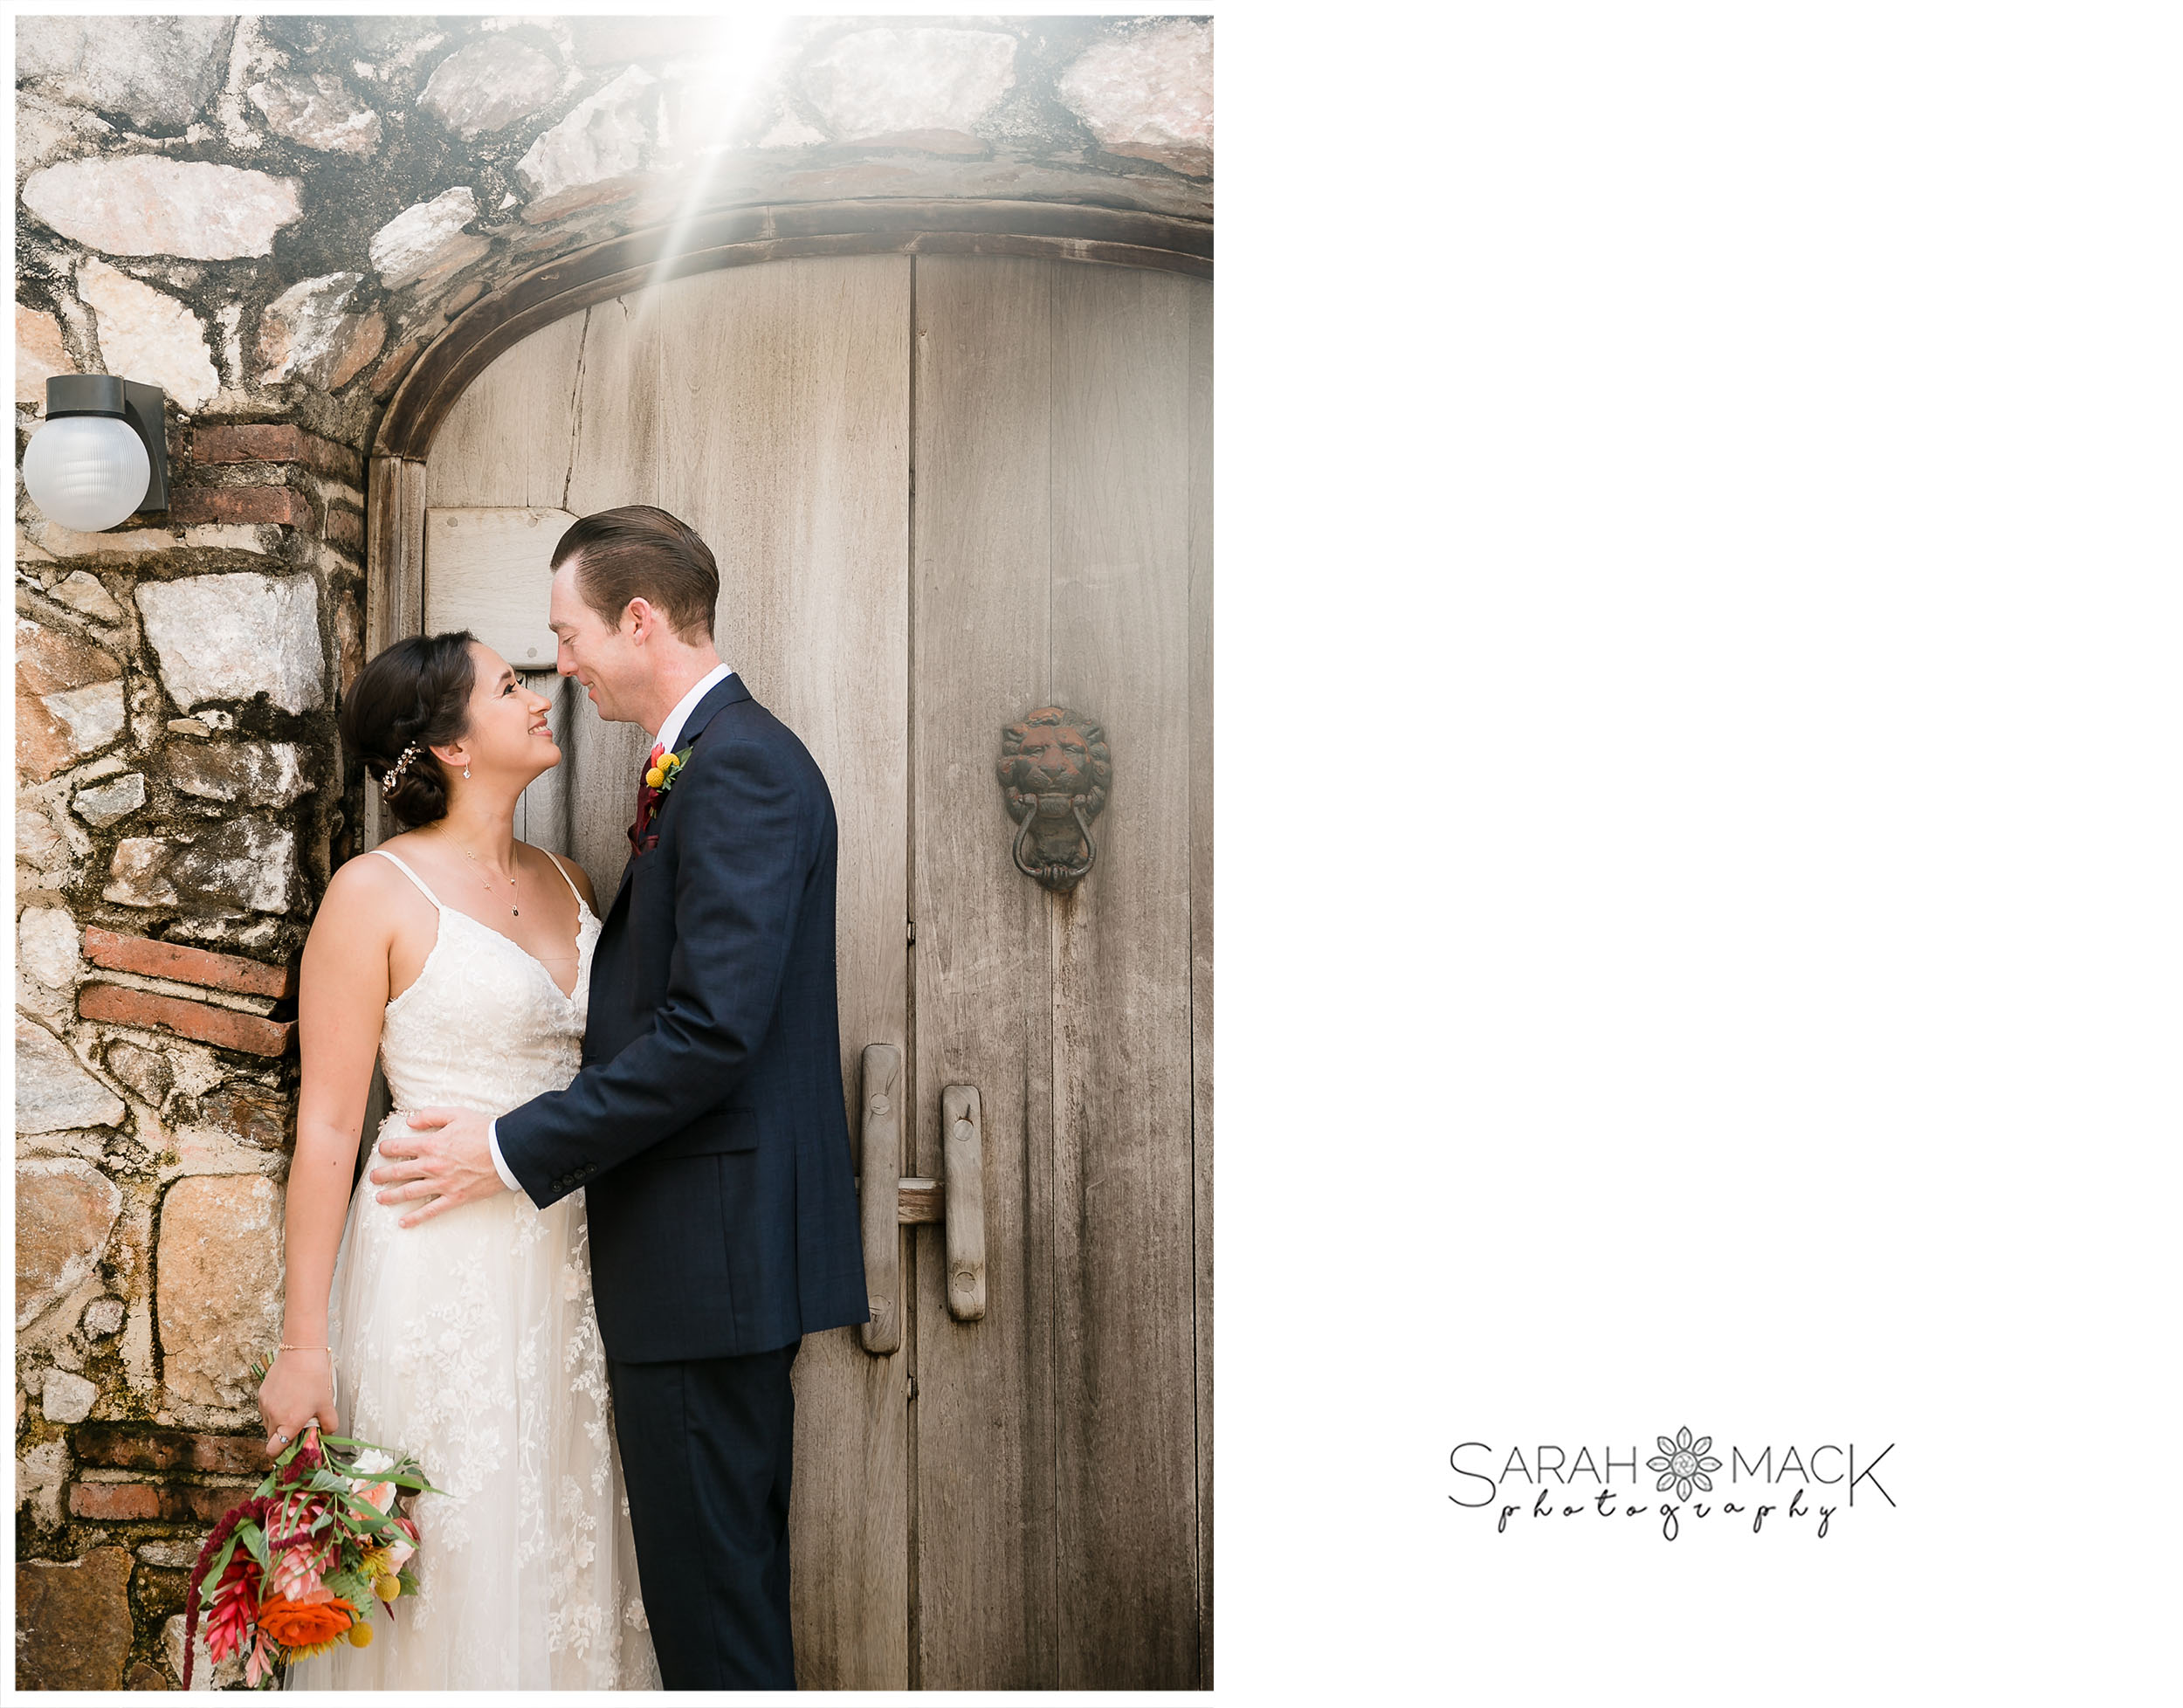 ES-Flor-de-Playa-Sayulita-Wedding-Photography-28.jpg